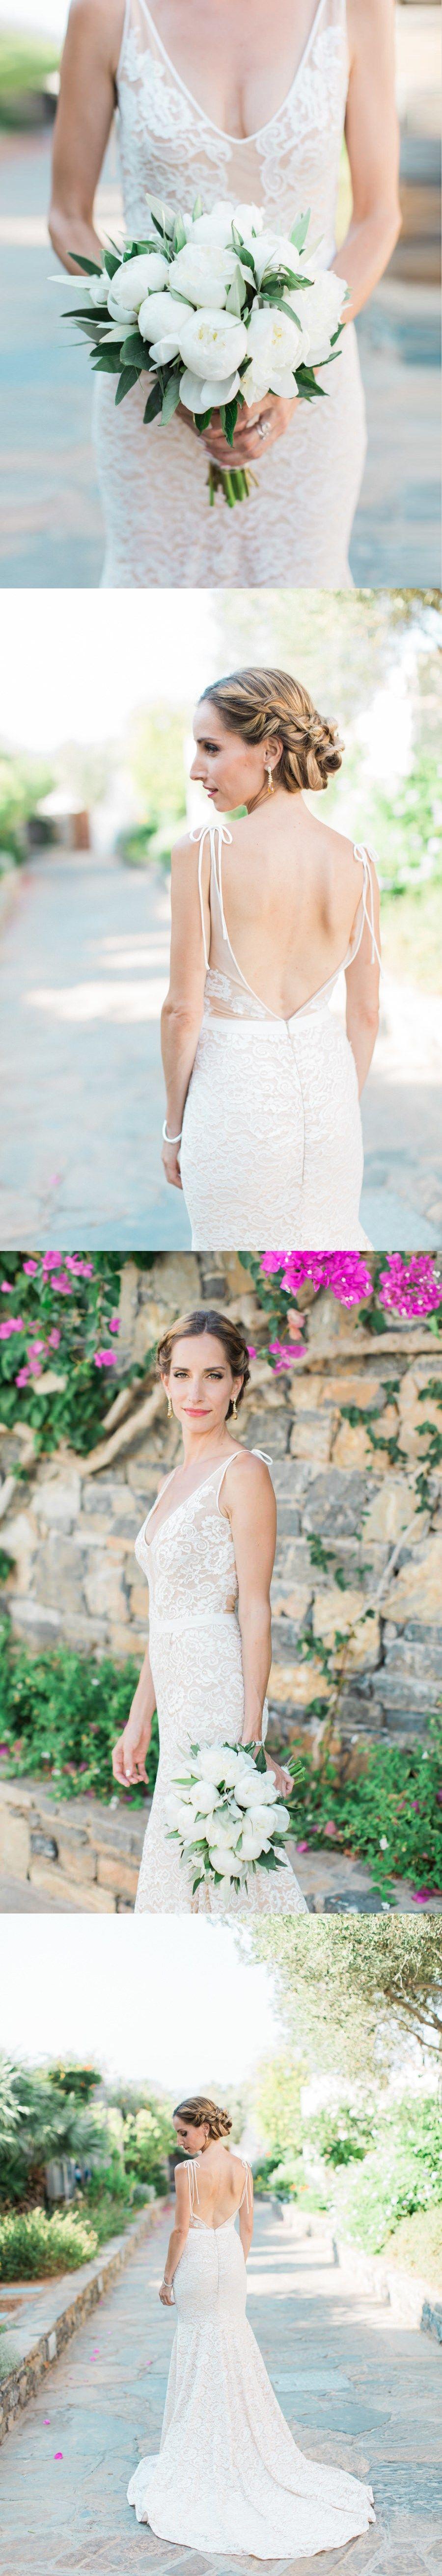 Mermaid open back wedding dresses spaghetti straps sweep train lace